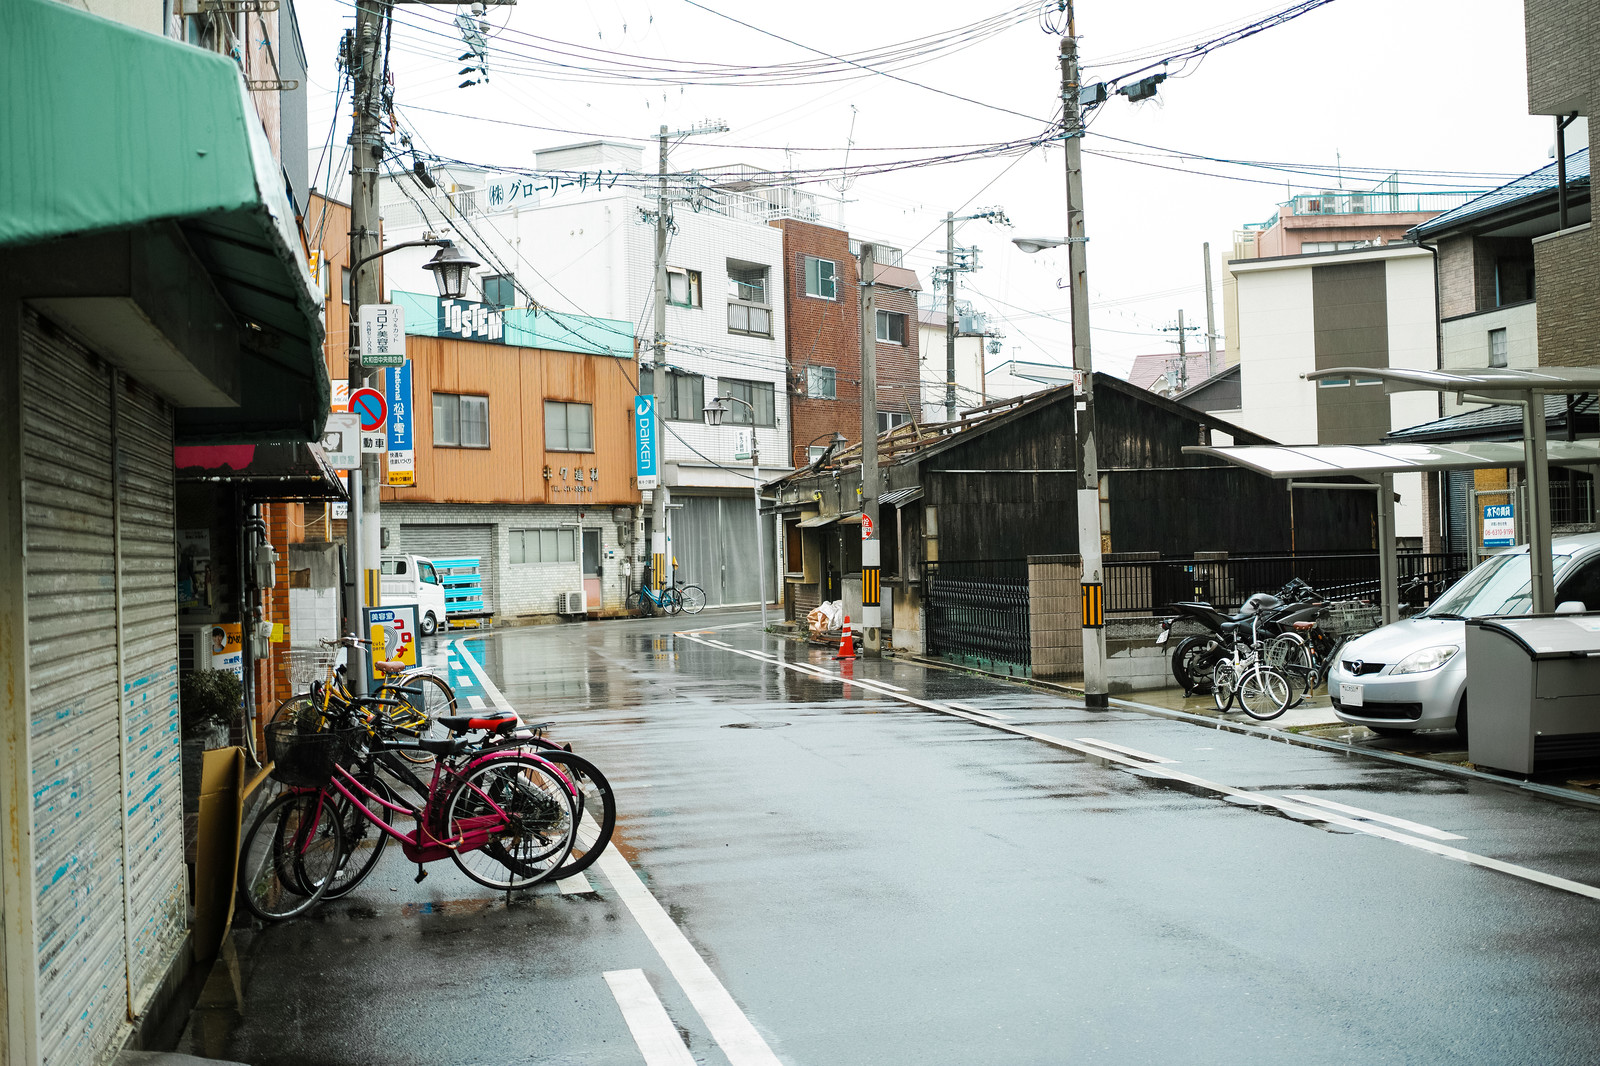 「GIGAZINE第一倉庫(大阪市西淀川区大和田4丁目12-10)前」の写真